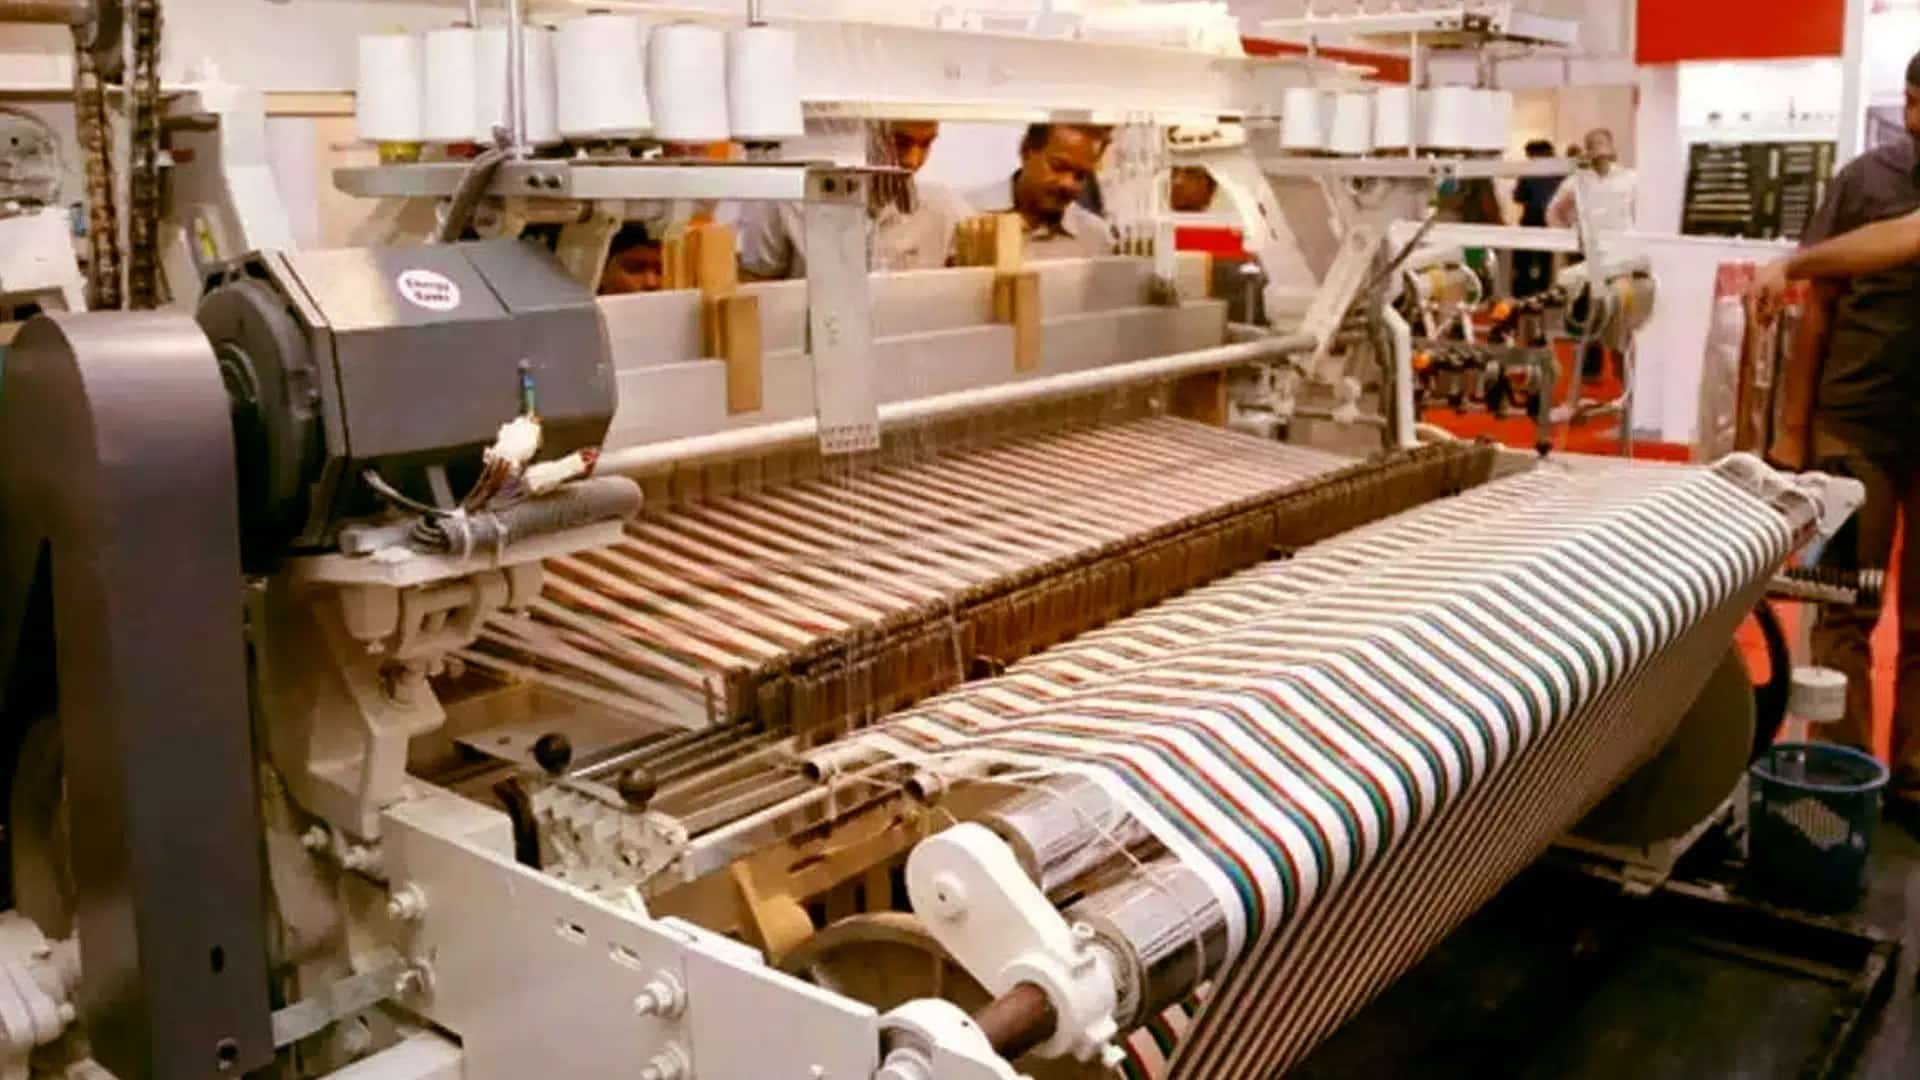 Centre approves Rs 10,683 crore PLI scheme for textile sector; details here